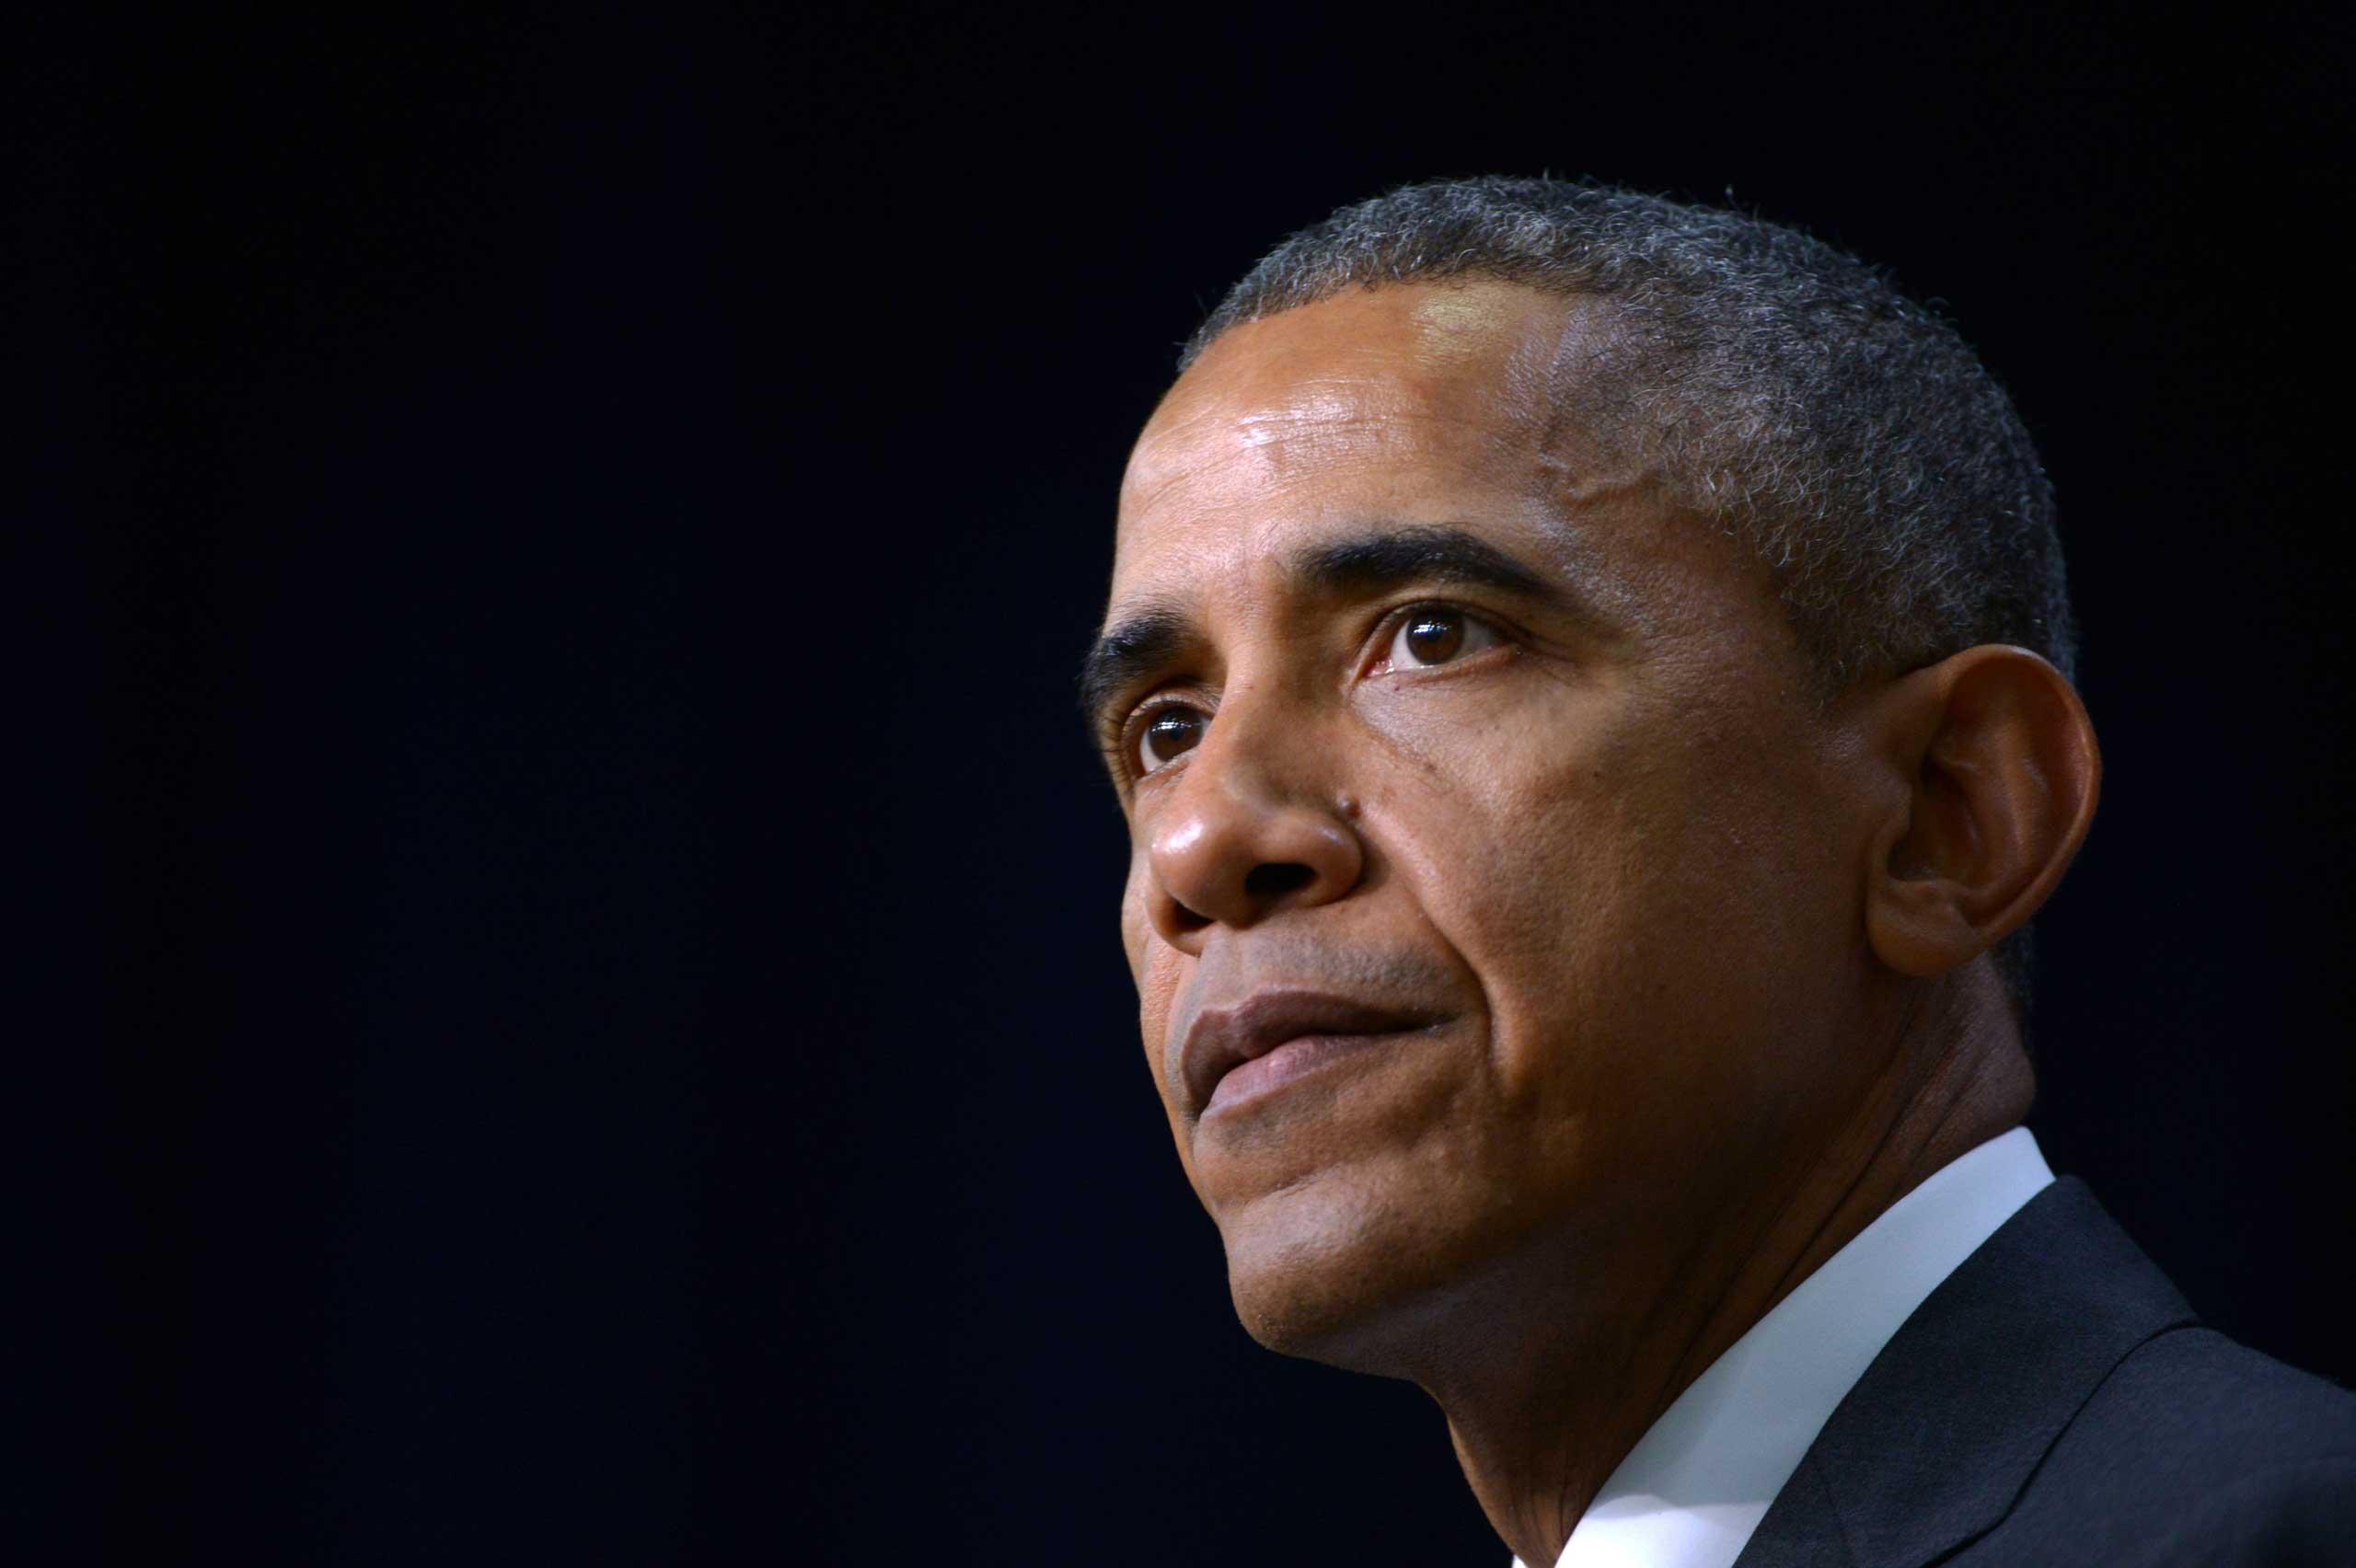 U.S. President Barack Obama speaks in Washington on Feb. 11, 2015.